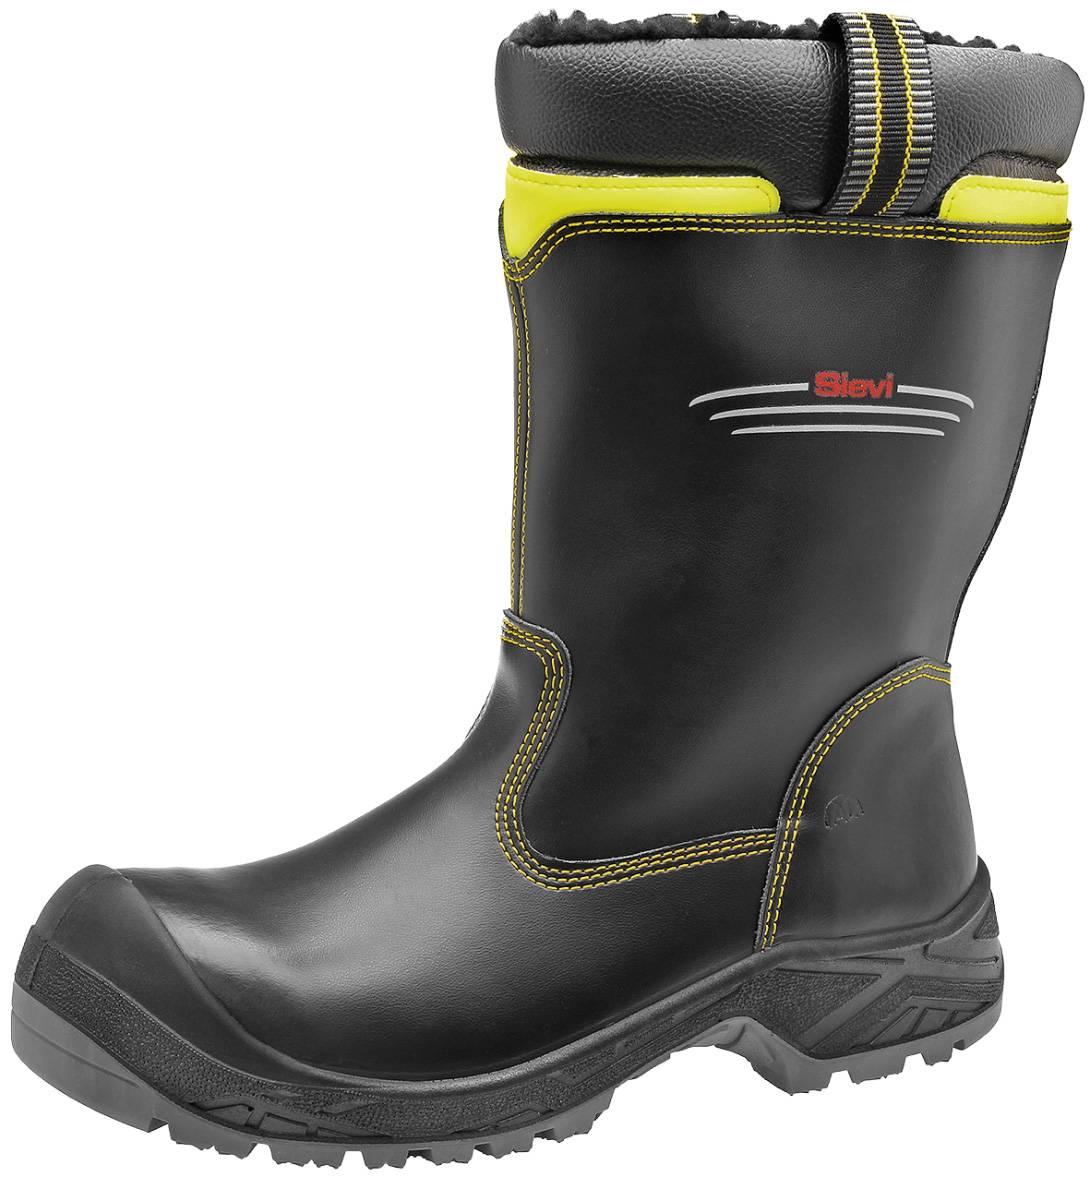 c5d072c6 Sievi Safety Boot Al Hit 9 XL+ S3 HRO 39-48 (SIE48-52085-393-0PM)